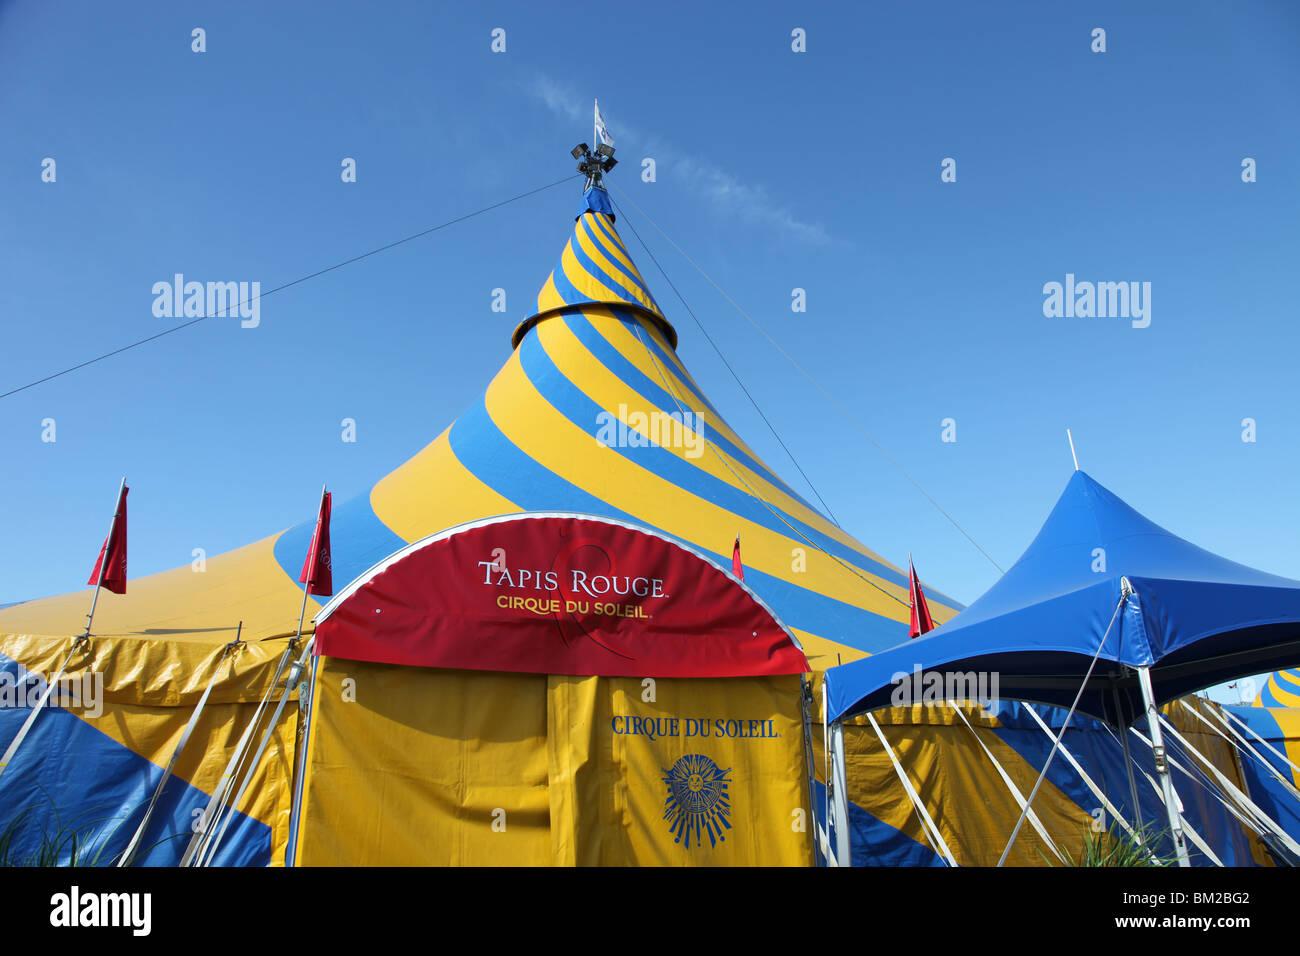 Cirque du Soleil Tapis Rouge (Red Carpet) tent & Cirque du Soleil Tapis Rouge (Red Carpet) tent Stock Photo ...